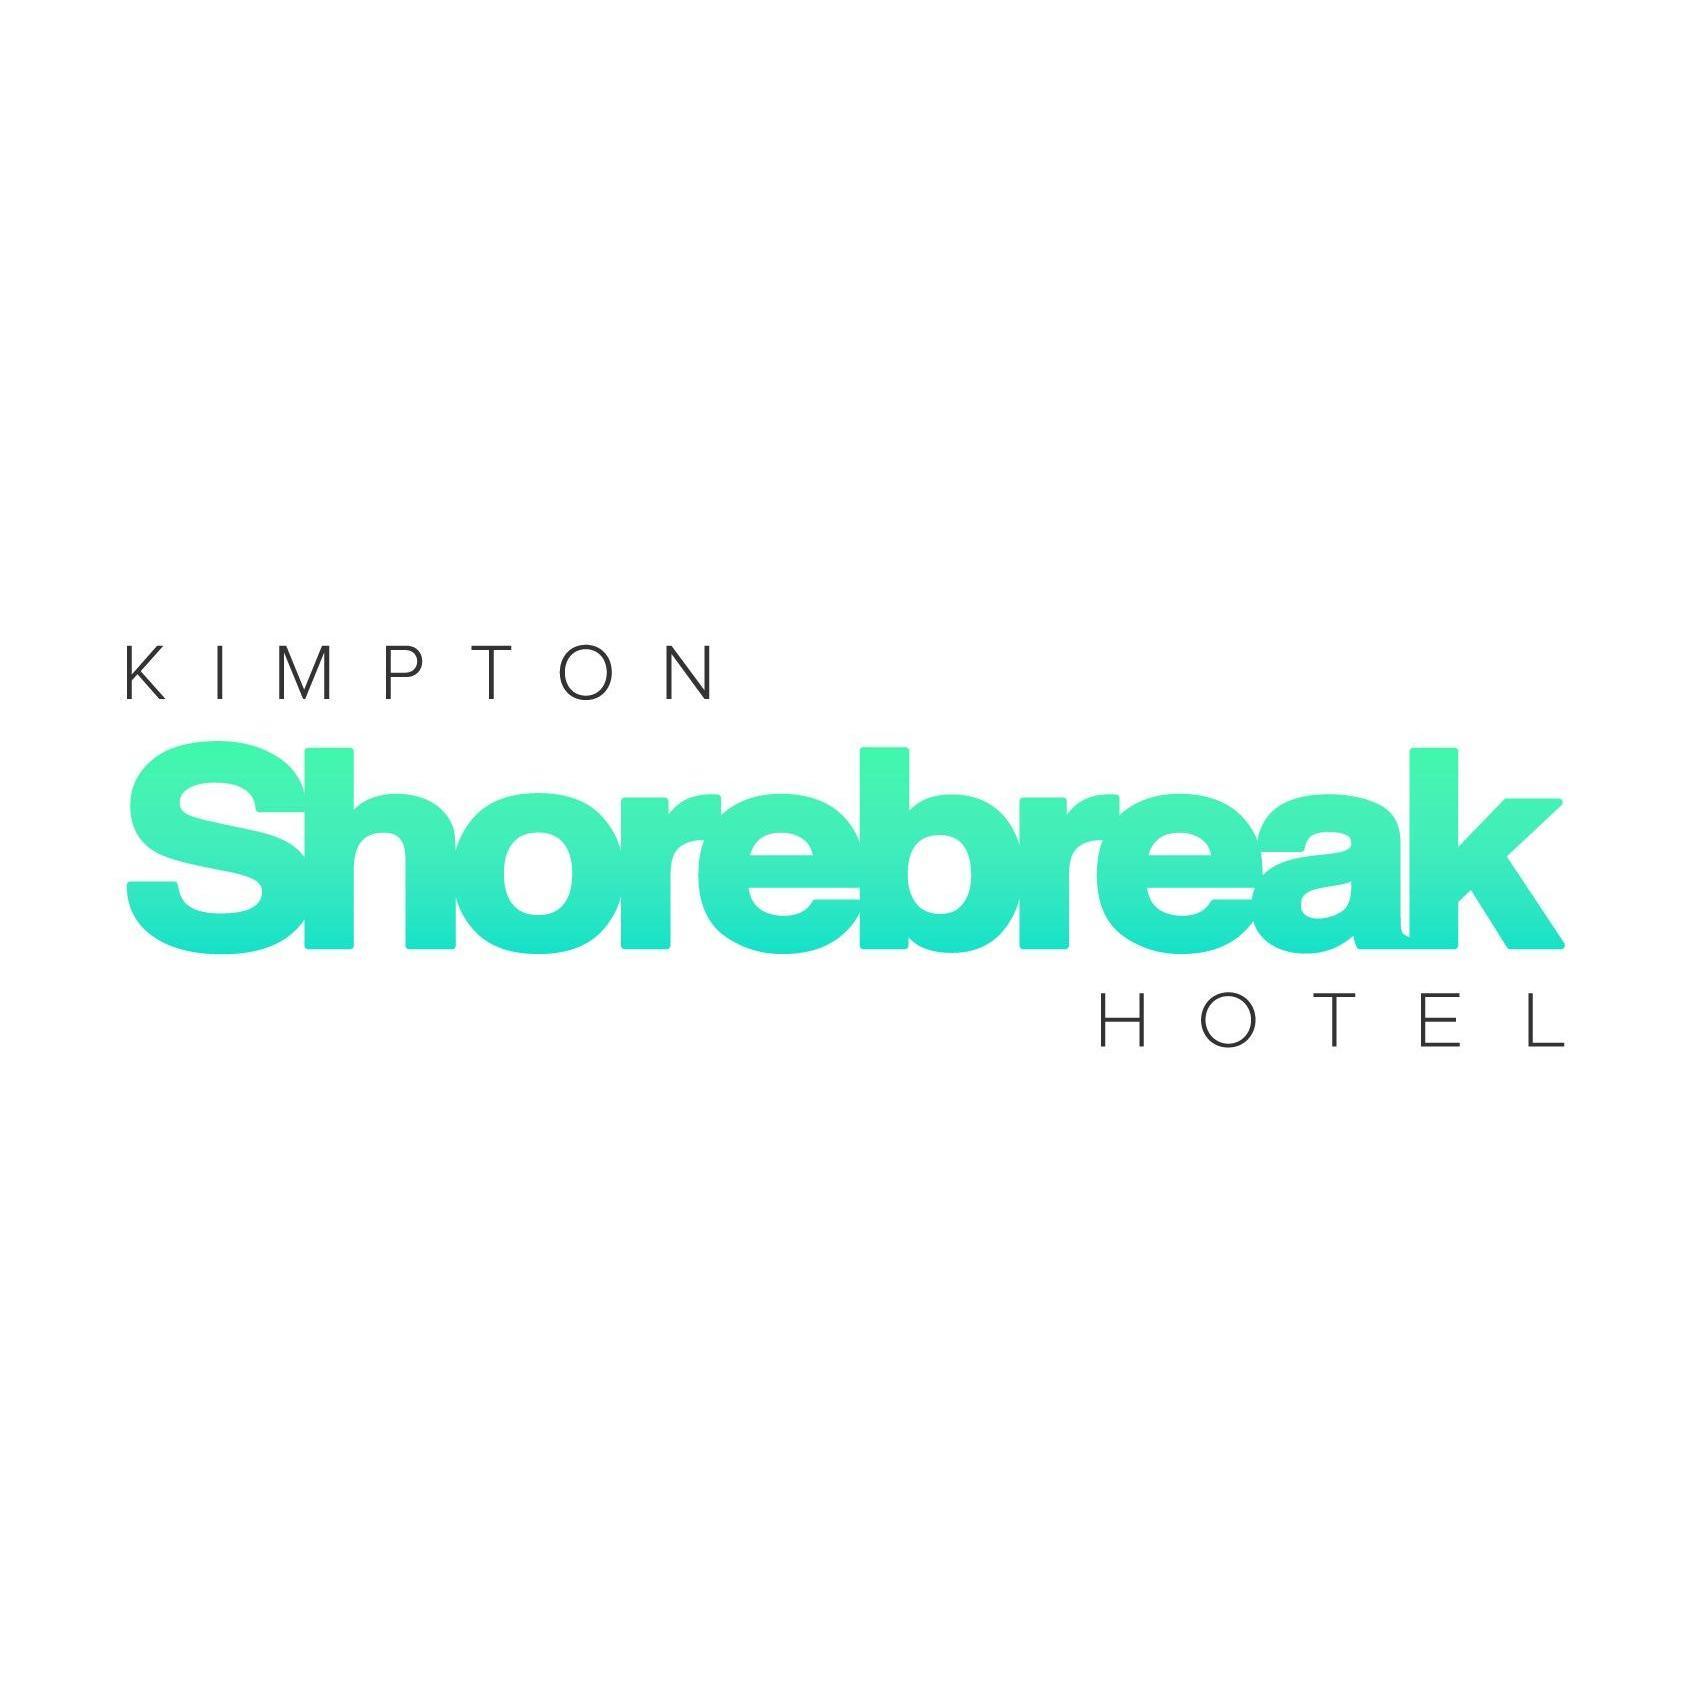 kimpton shorebreak hotel coupons near me in huntington. Black Bedroom Furniture Sets. Home Design Ideas